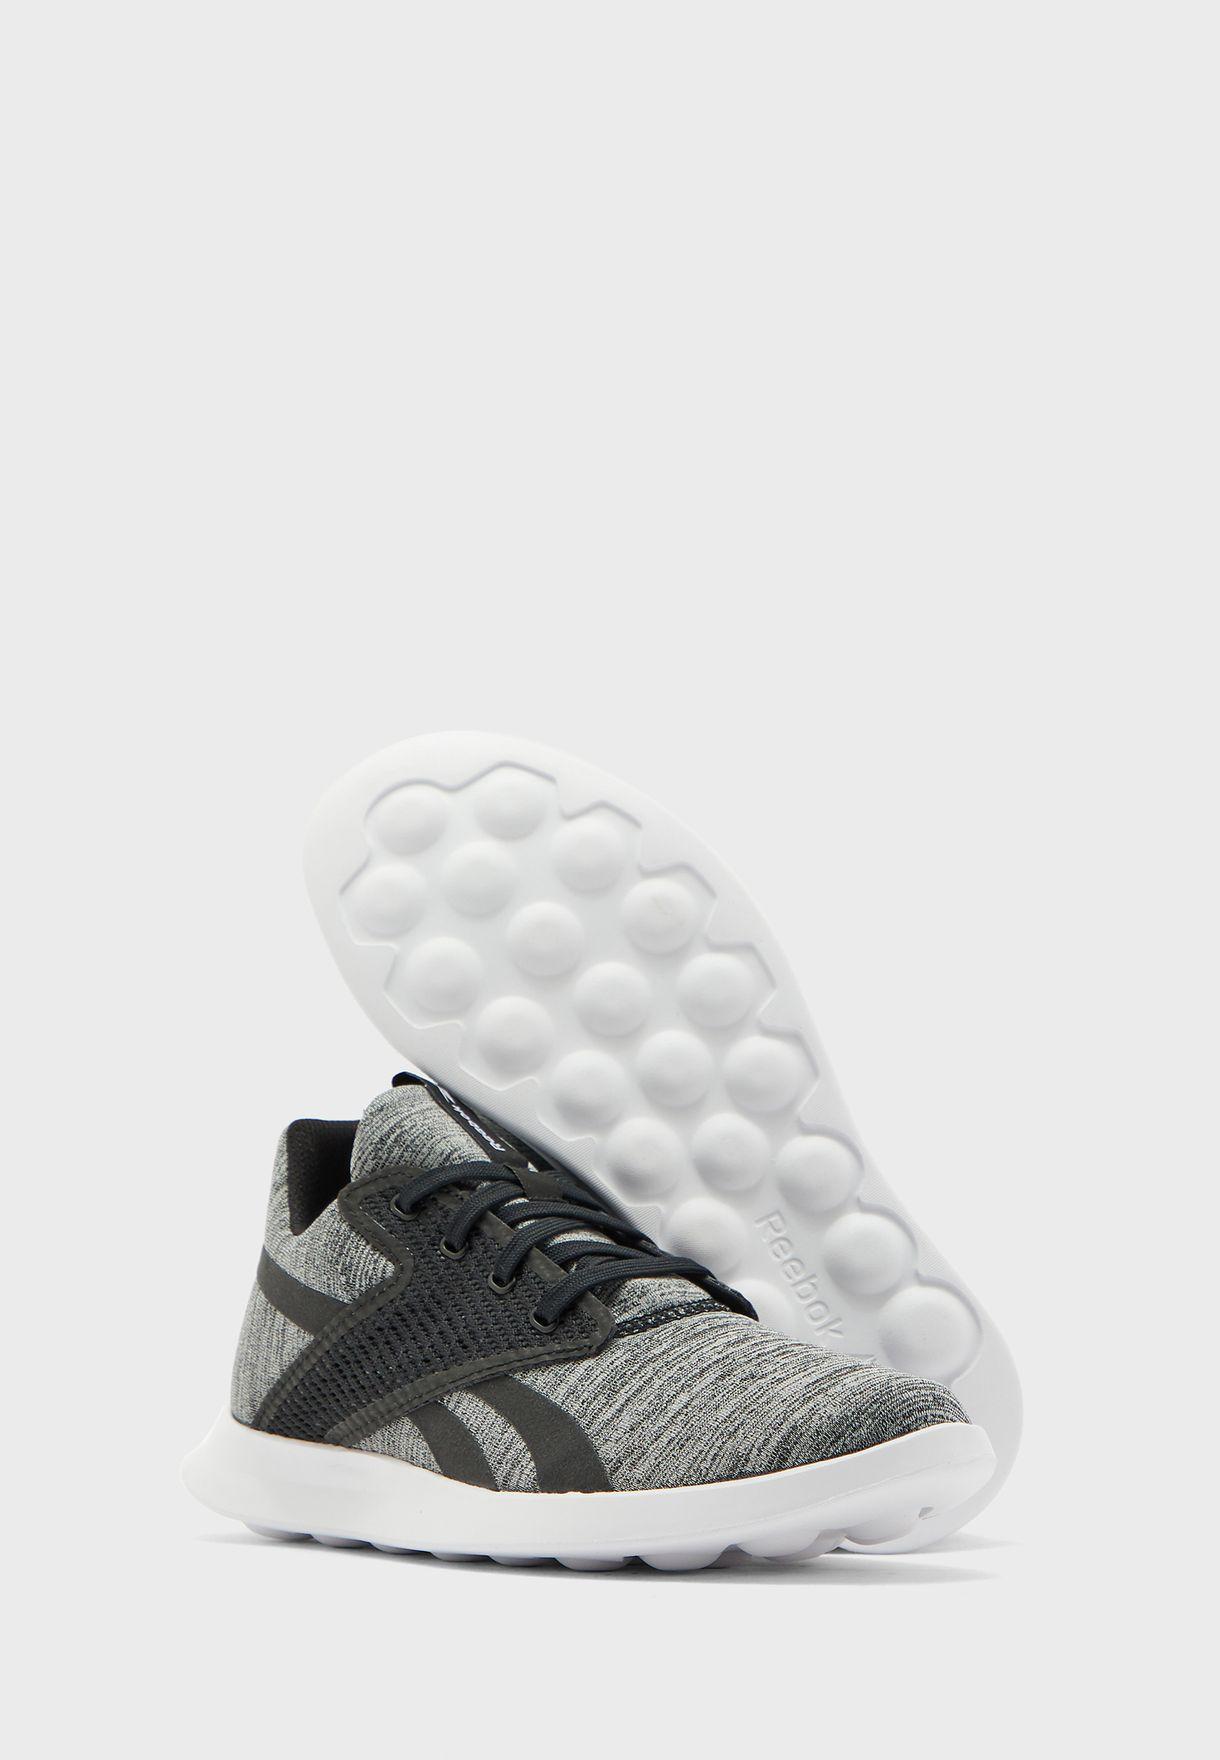 Evazure DMX Lite 3.0 Sports Walking Women's Shoes